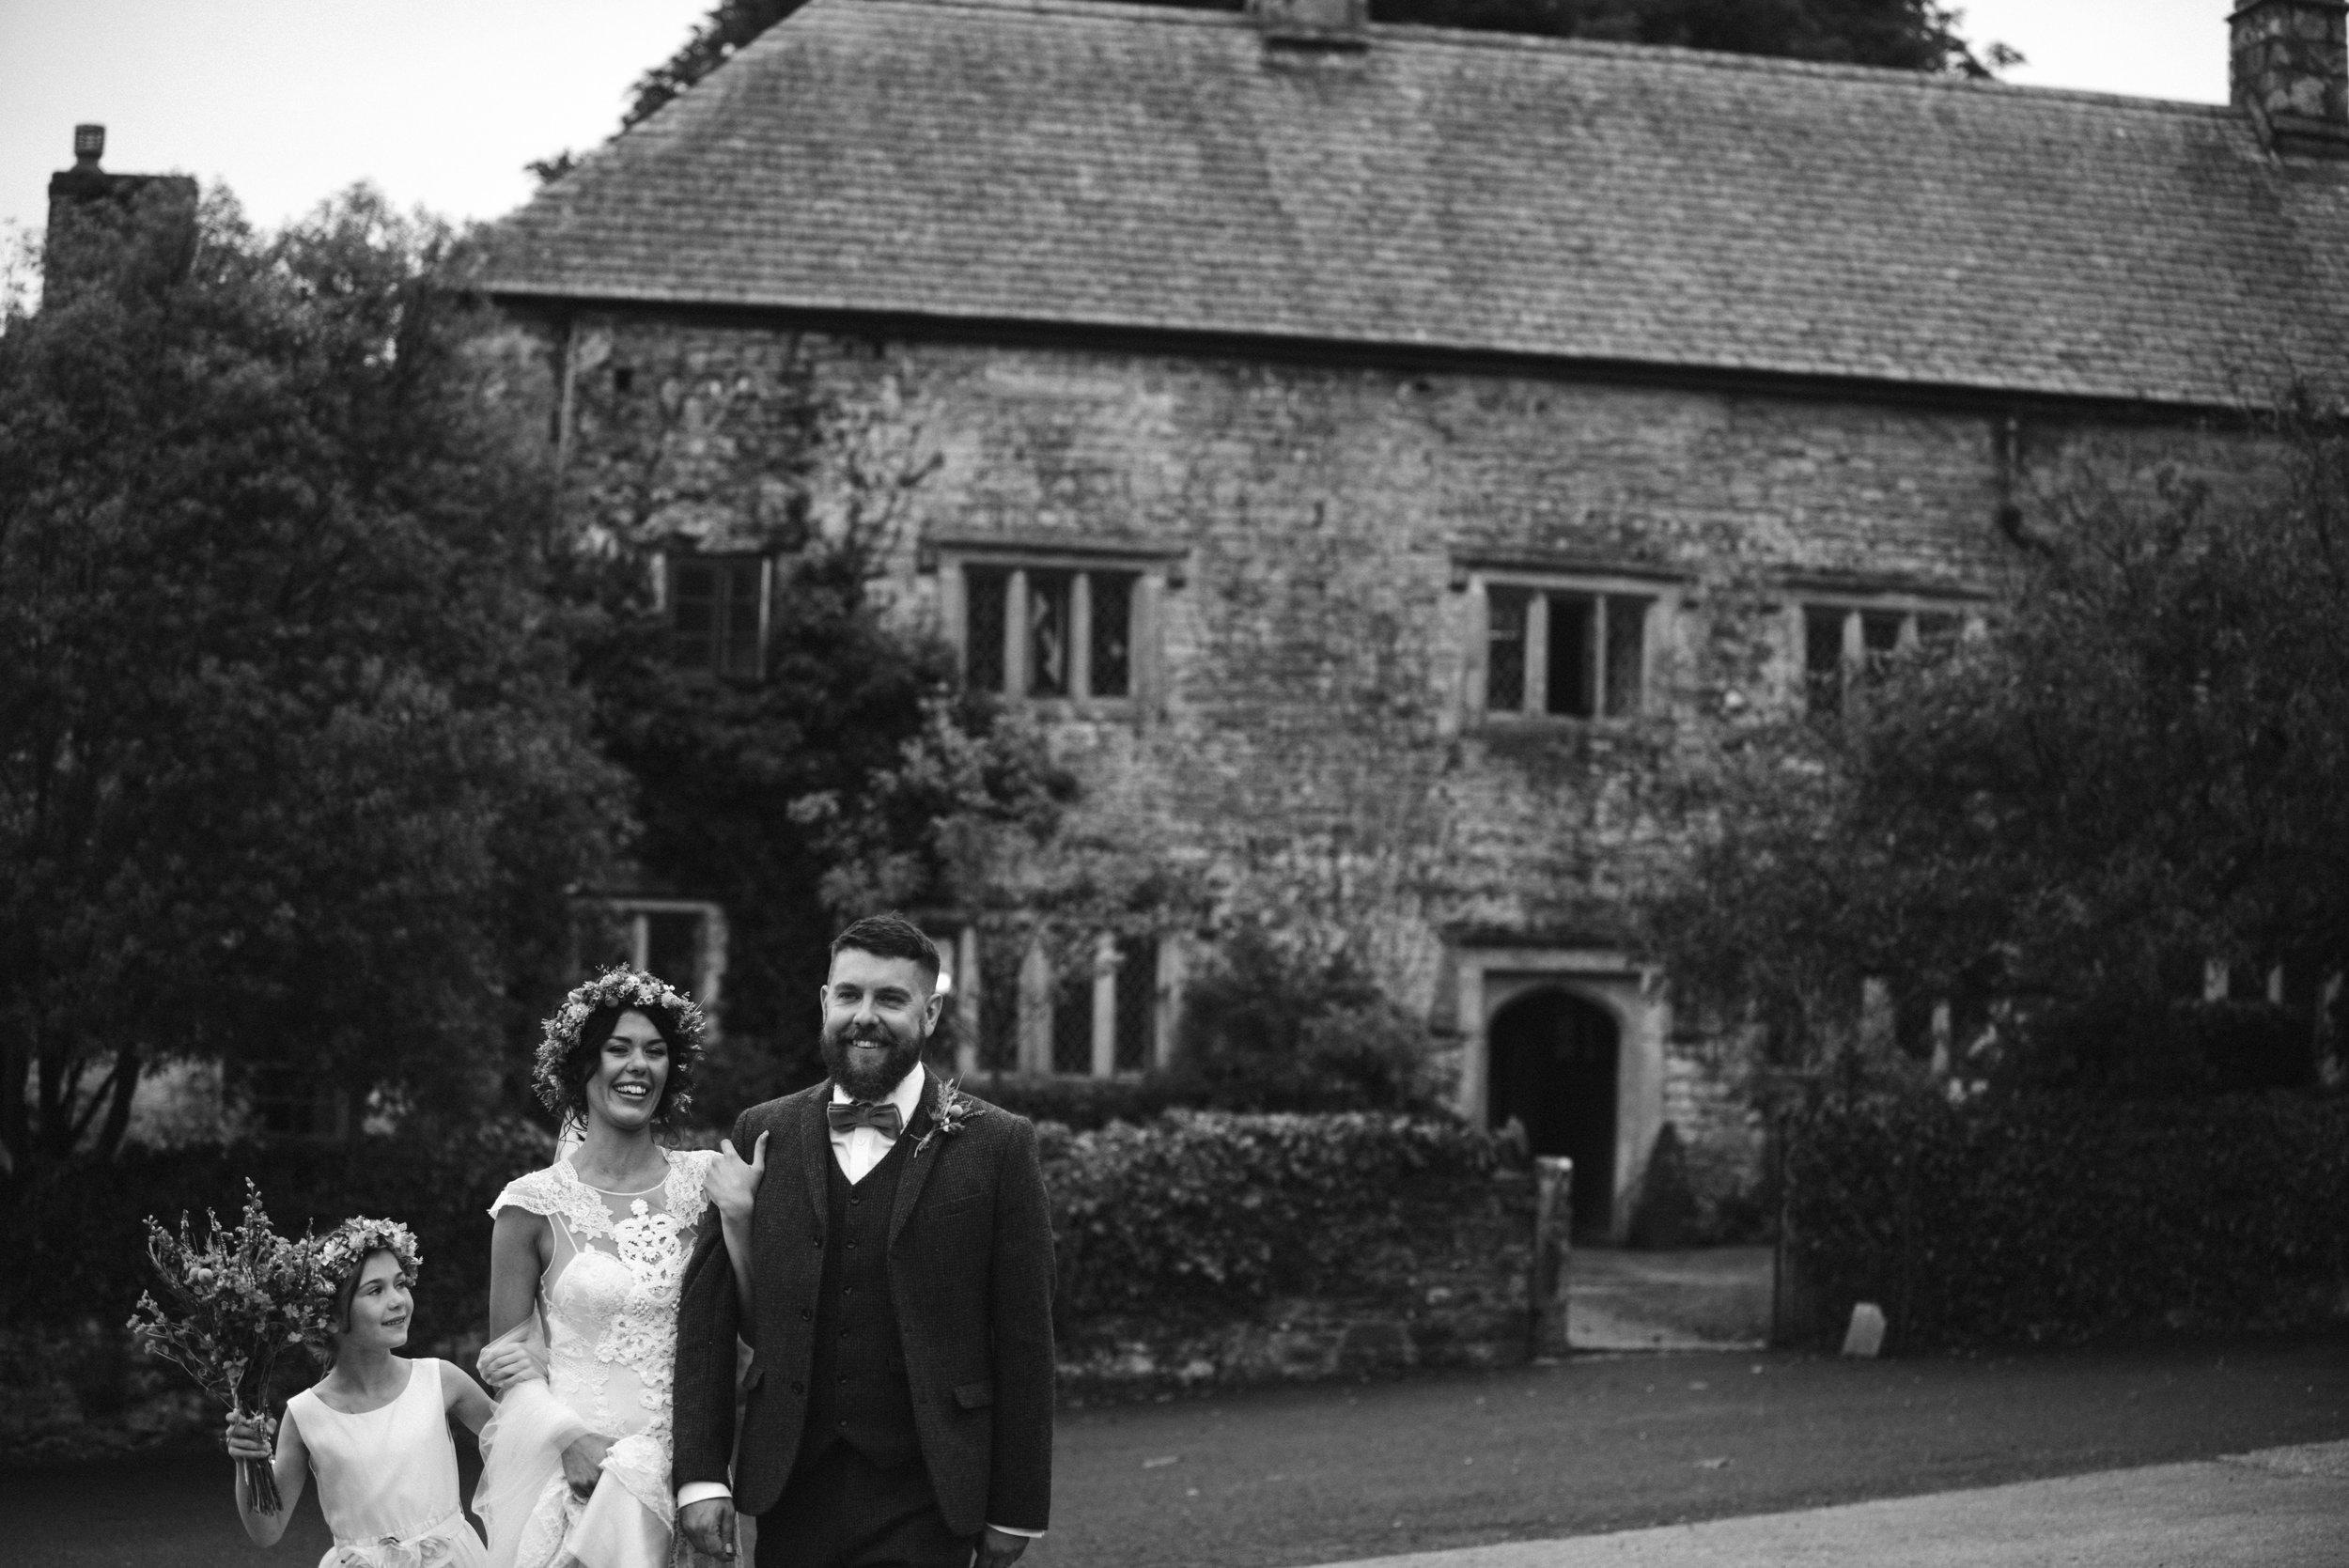 pengenna-manor-wedding-photographer-35.jpg